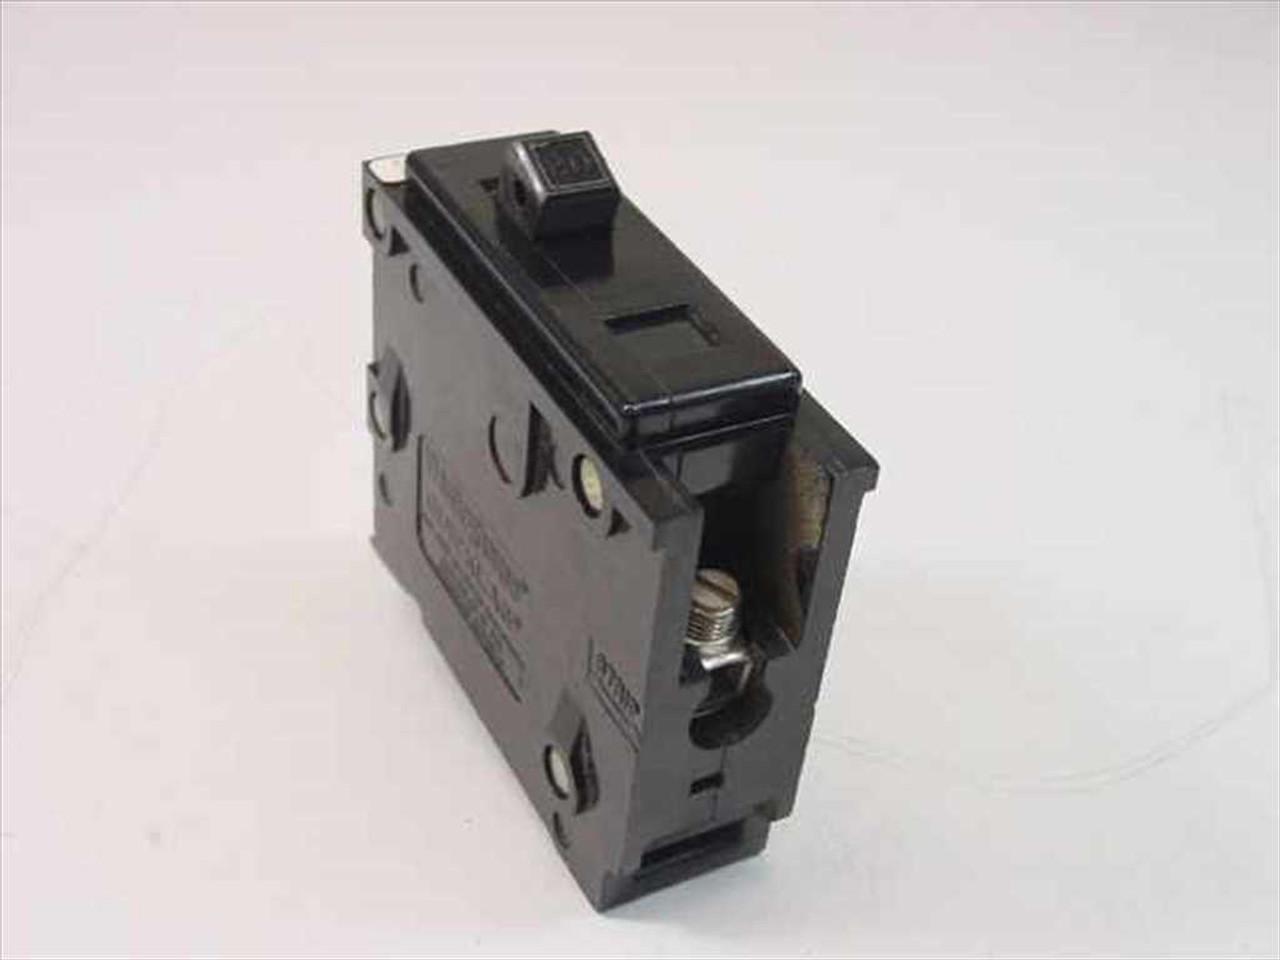 westinghouse mj 2239 quicklag type ba 1 pole 20 amp circuit breaker recycledgoods com [ 1024 x 768 Pixel ]